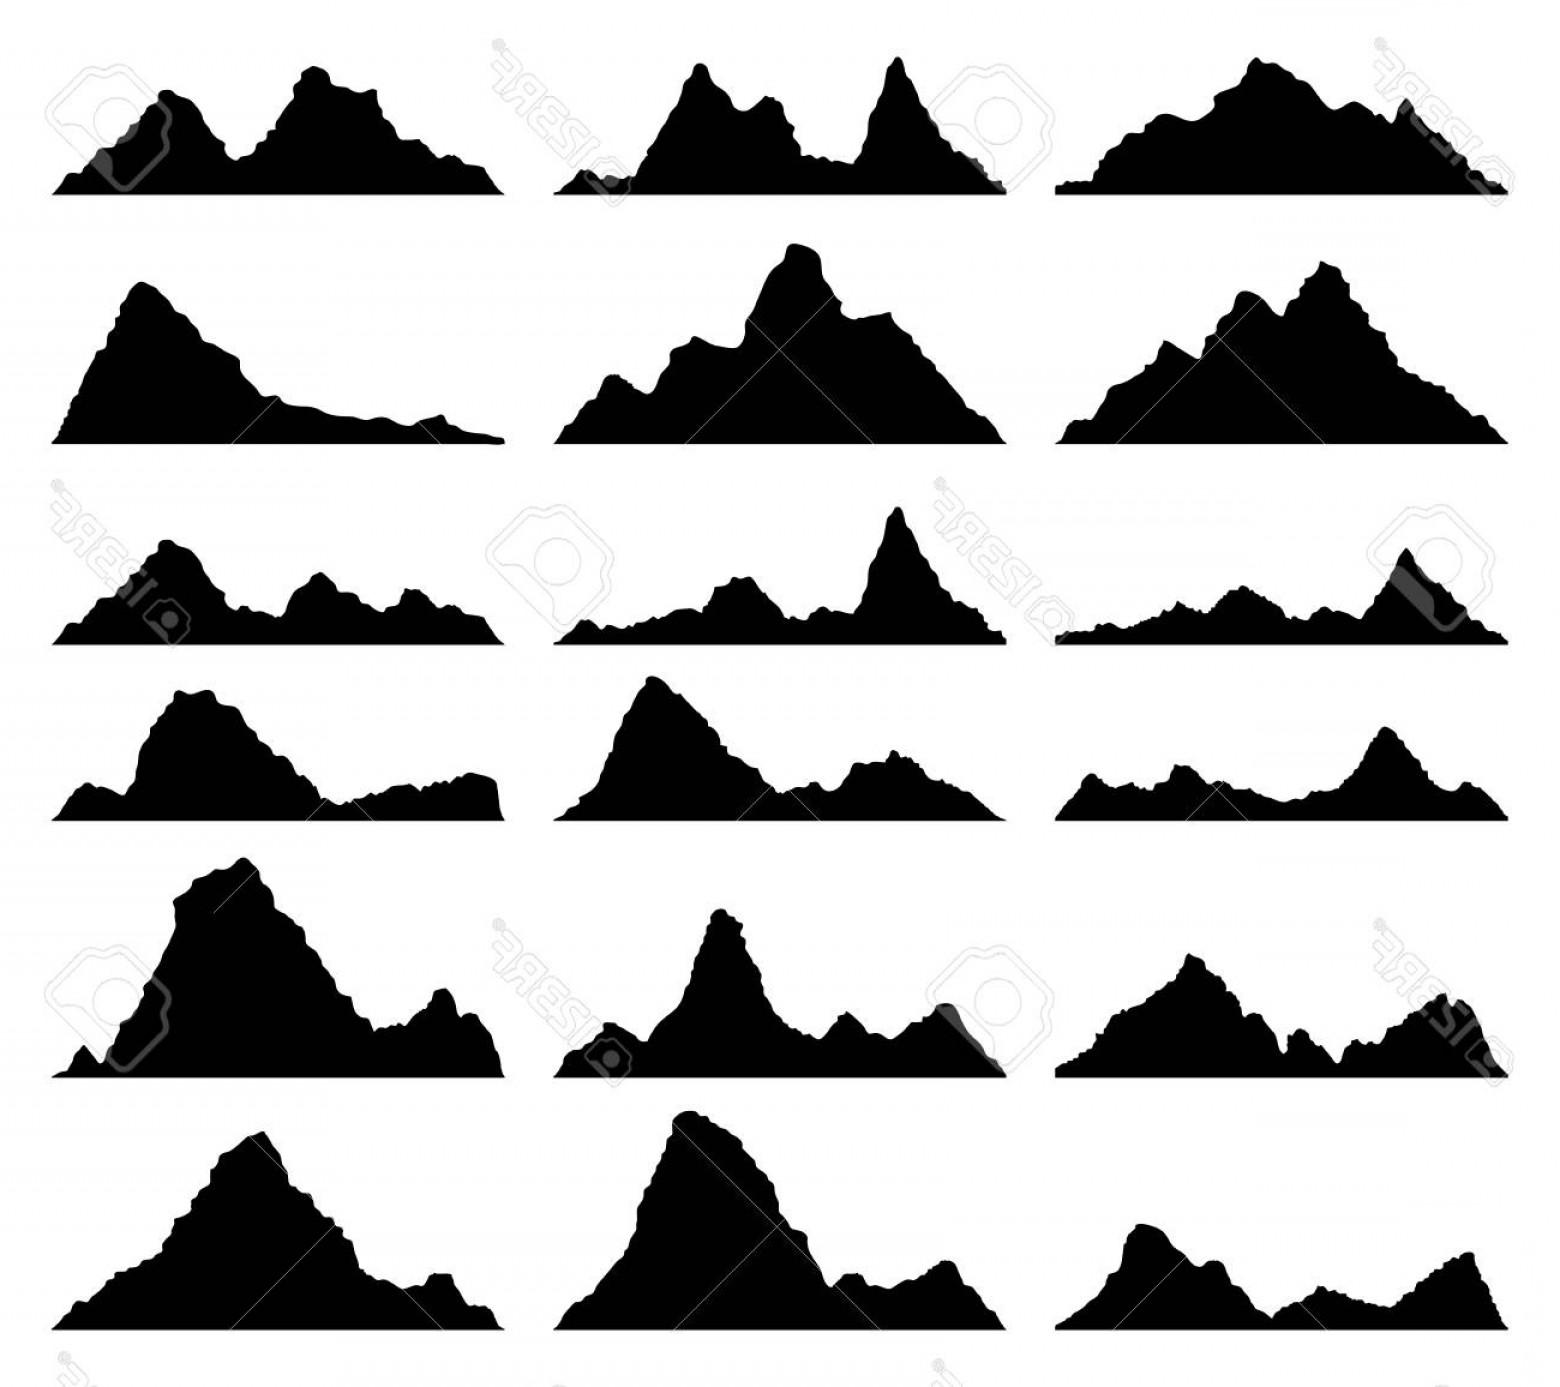 1560x1387 Photostock Vector Vector Set Of Black And White Mountain